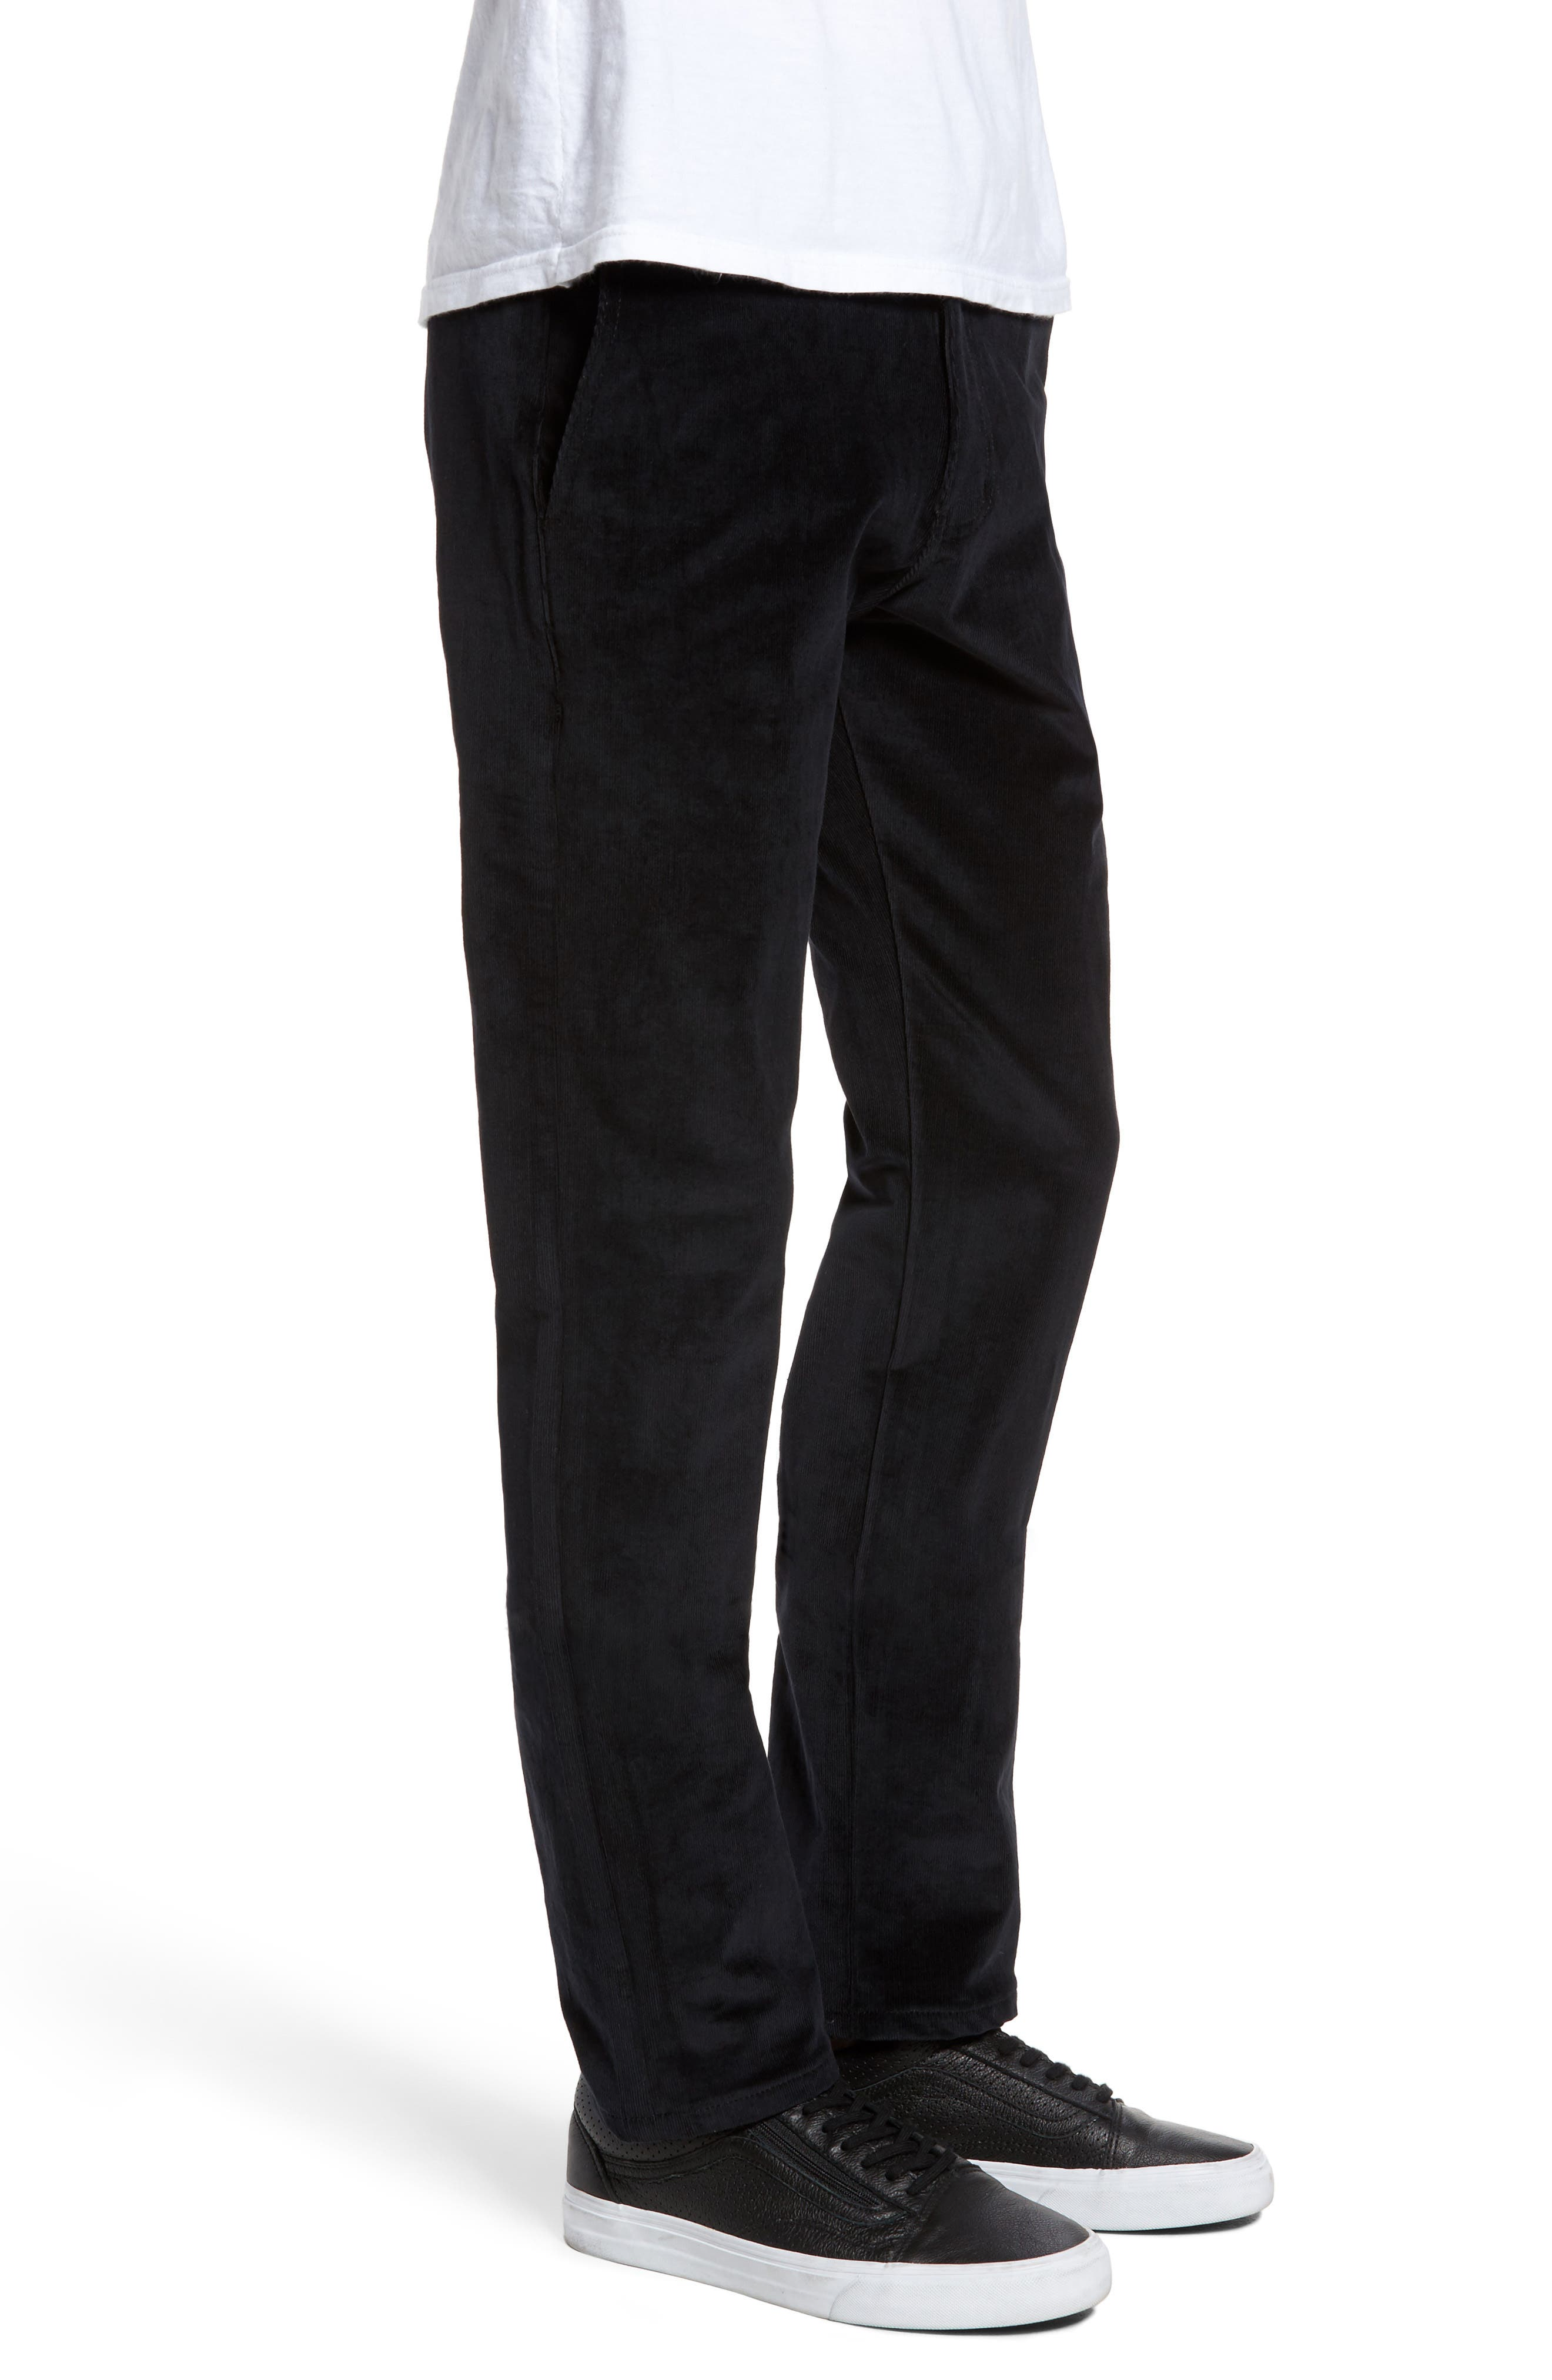 Naked & Famous Slim Chino Slim Fit Corduroy Pants,                             Alternate thumbnail 3, color,                             Black